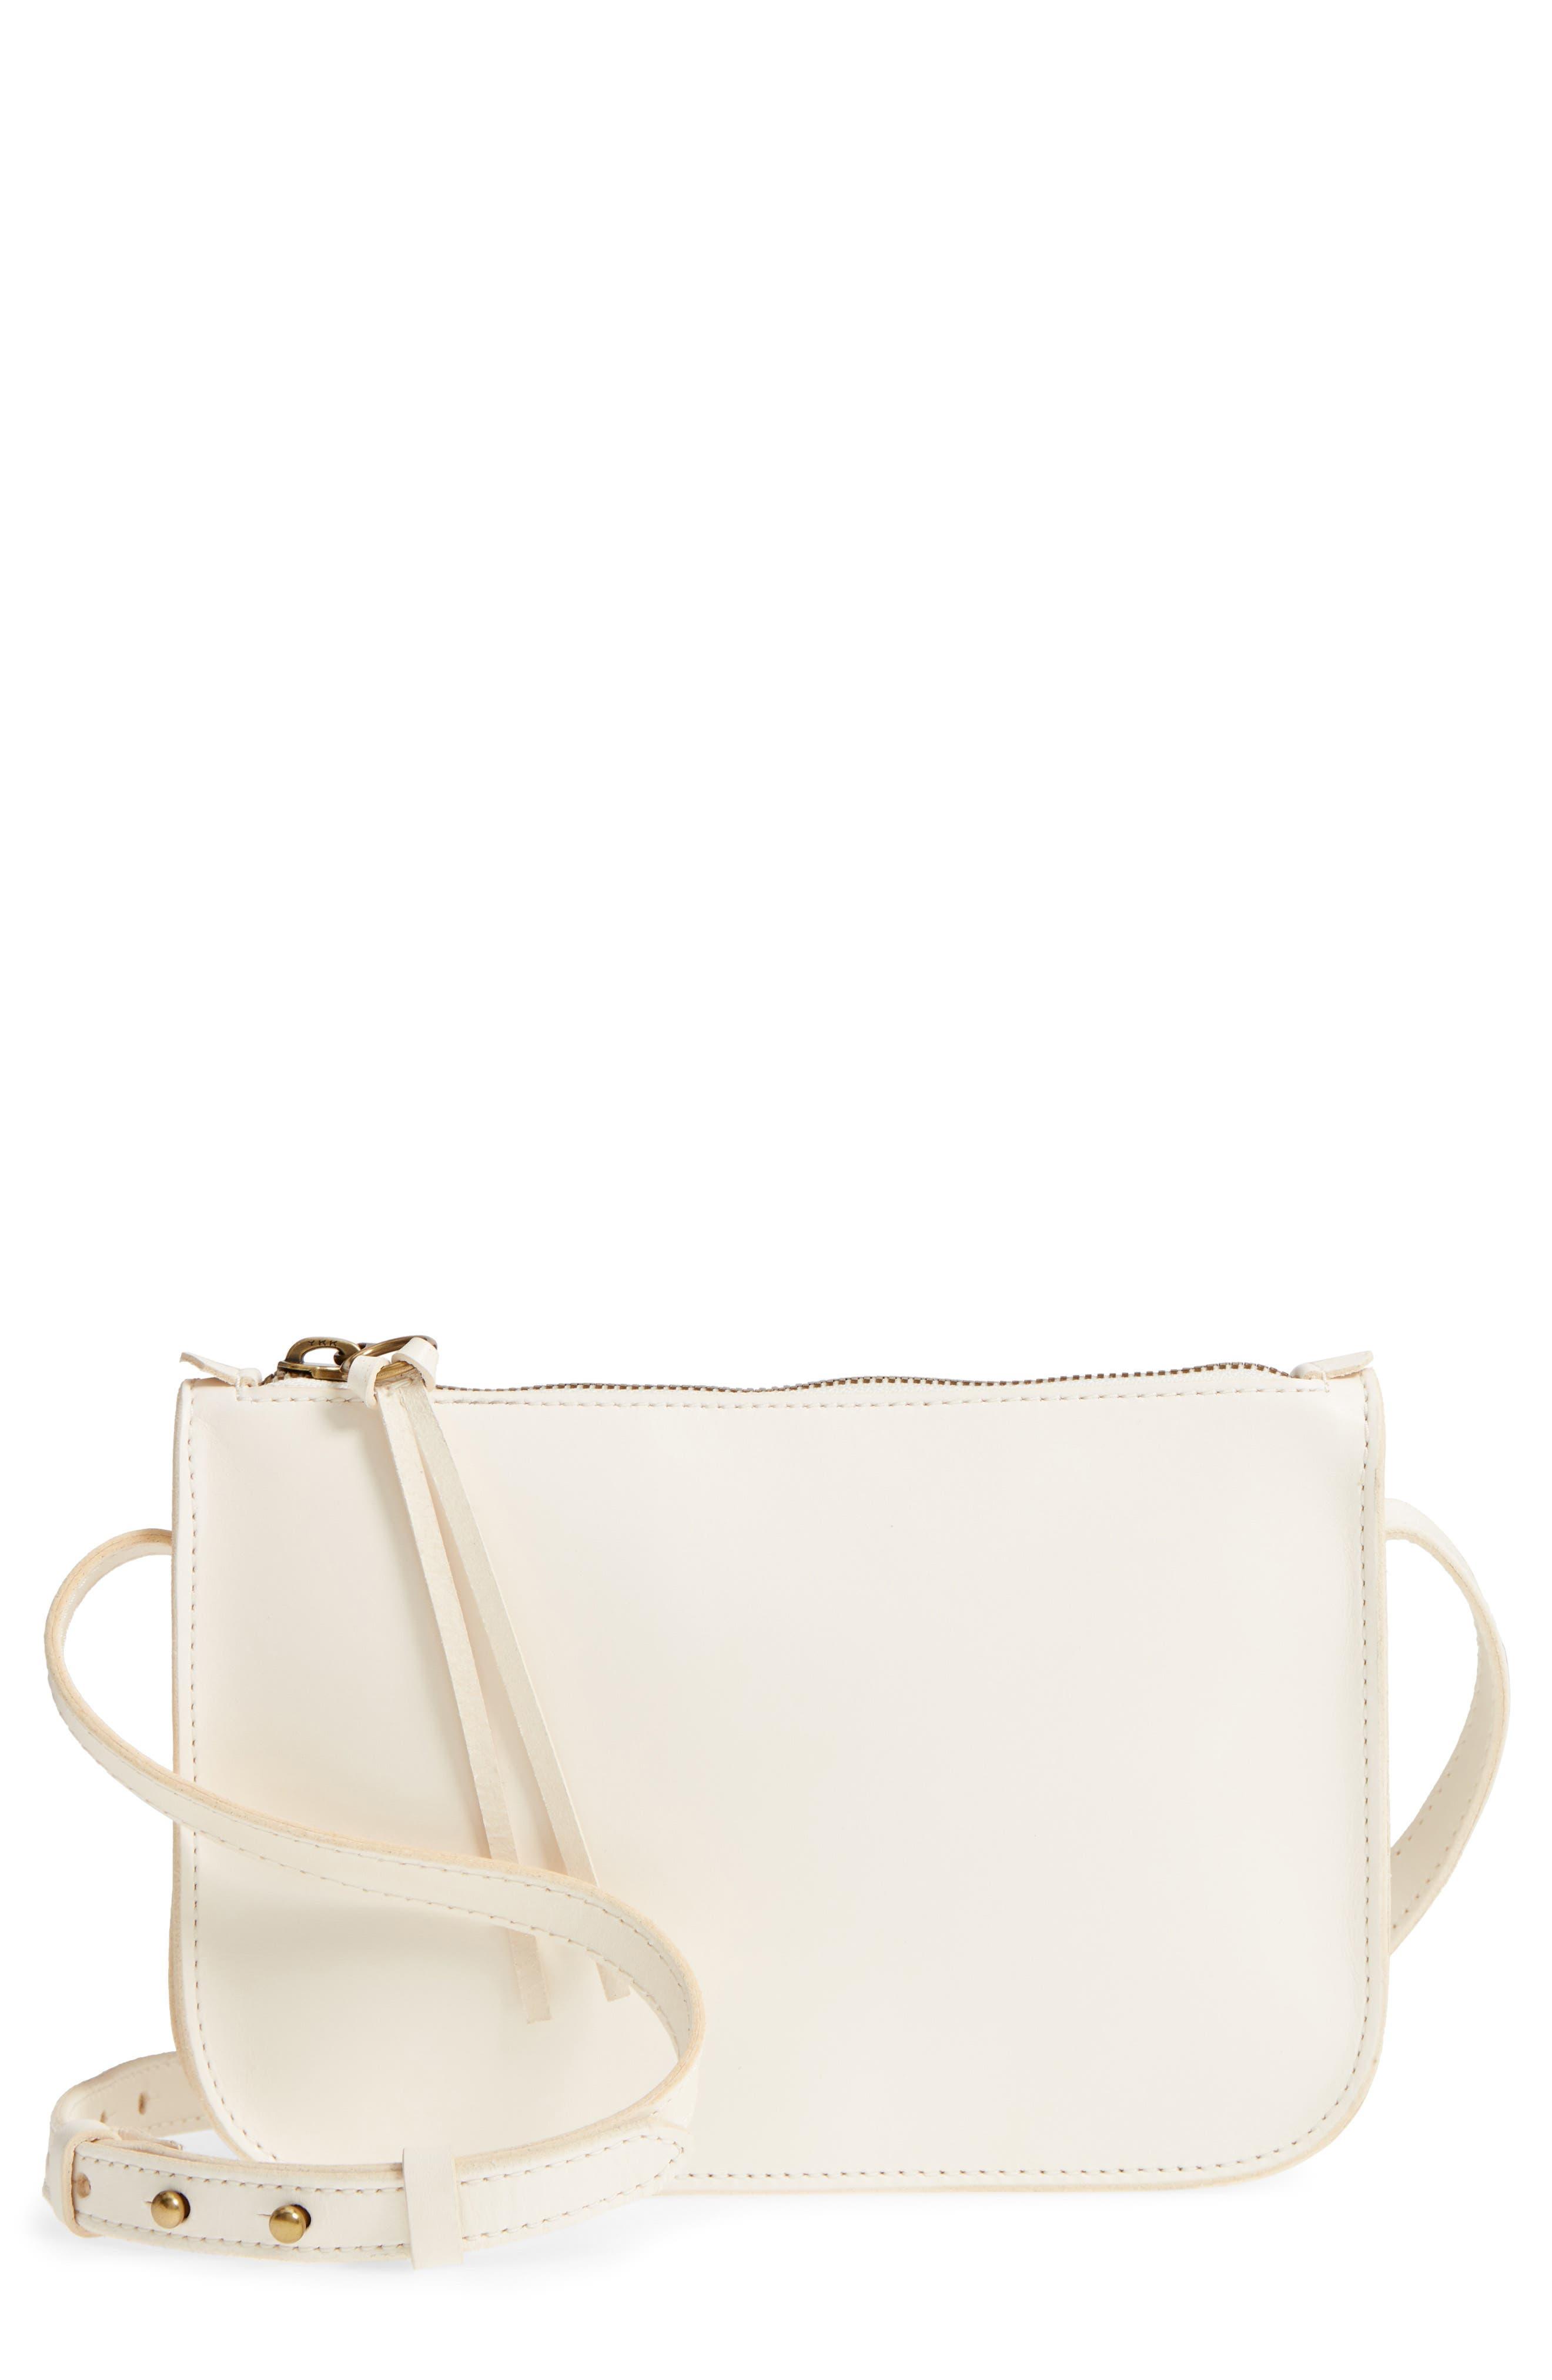 Simple Leather Crossbody Bag,                             Main thumbnail 1, color,                             VINTAGE CANVAS